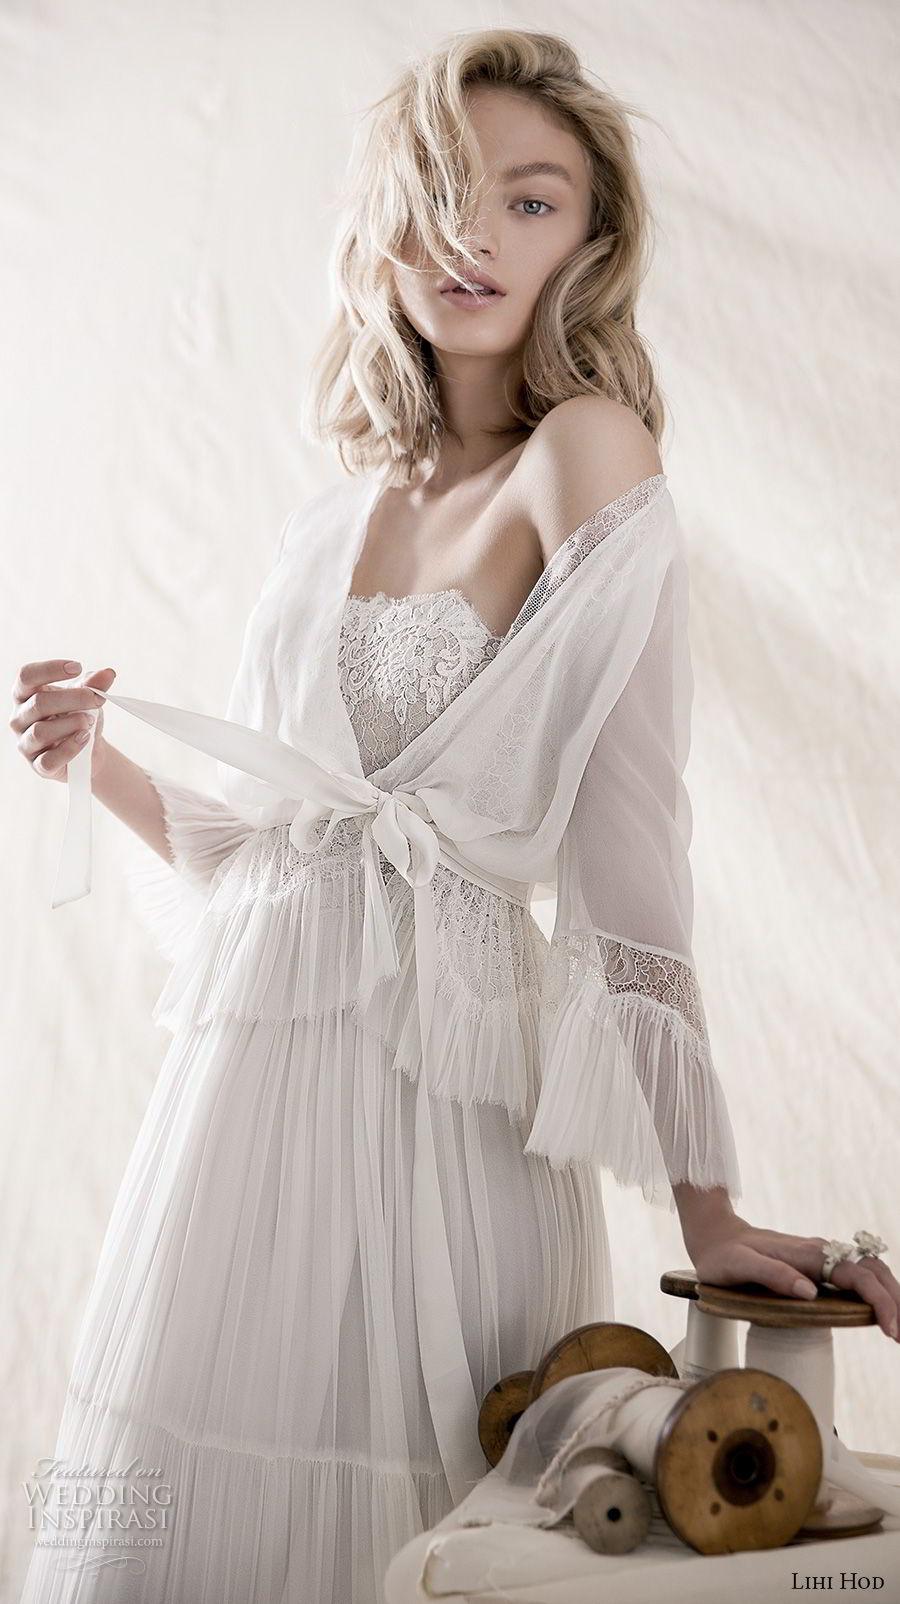 lihi hod 2018 bridal strapless straight across neckline heavily embellished bodice romantic bohemian soft a line wedding dress medium train (3) zv